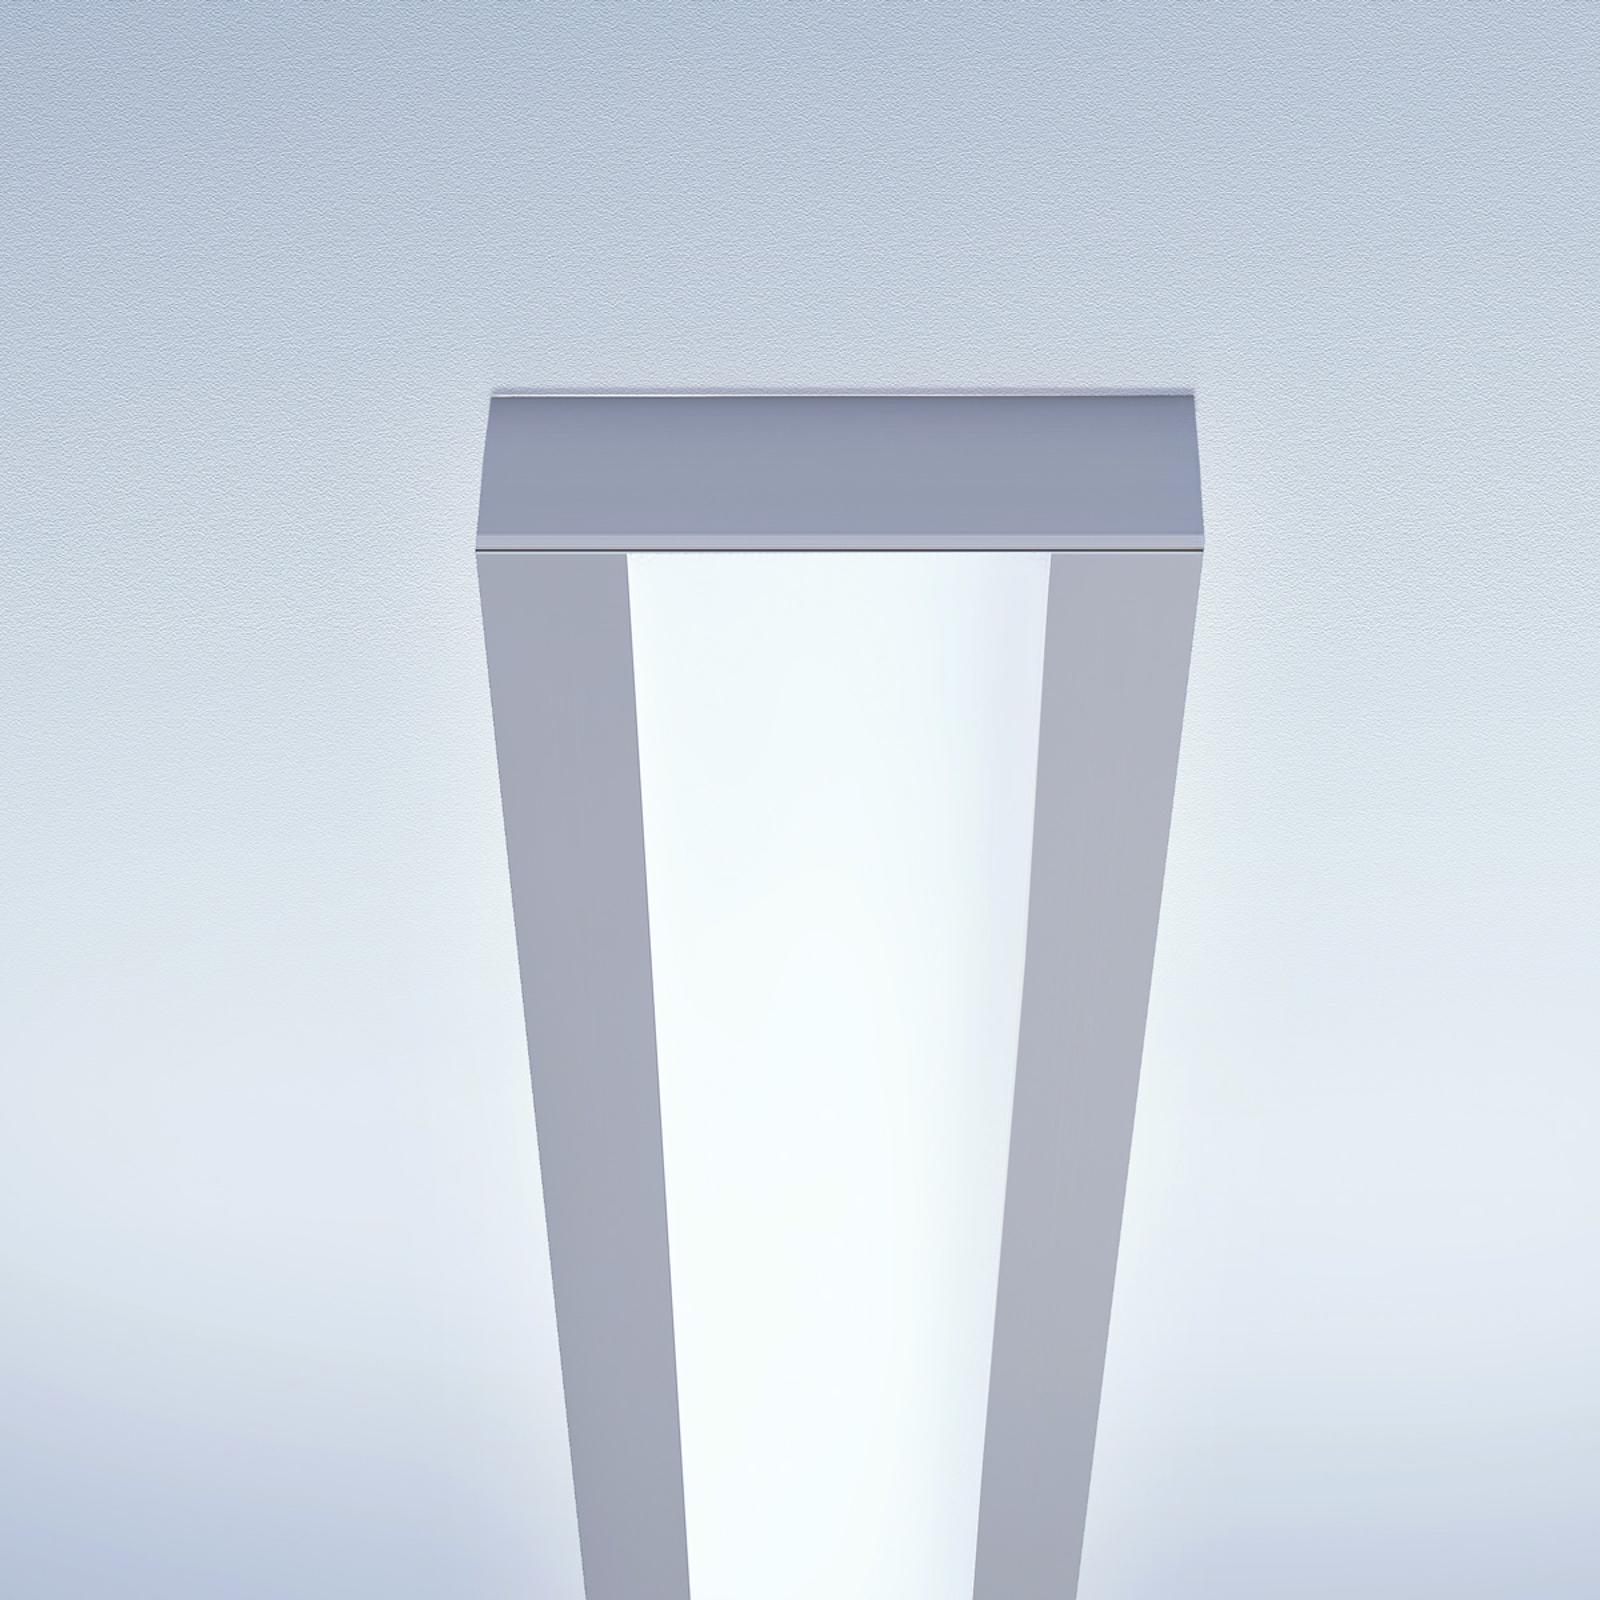 Pinta-asennuskattovalaisin LED Vison-A2 235 cm